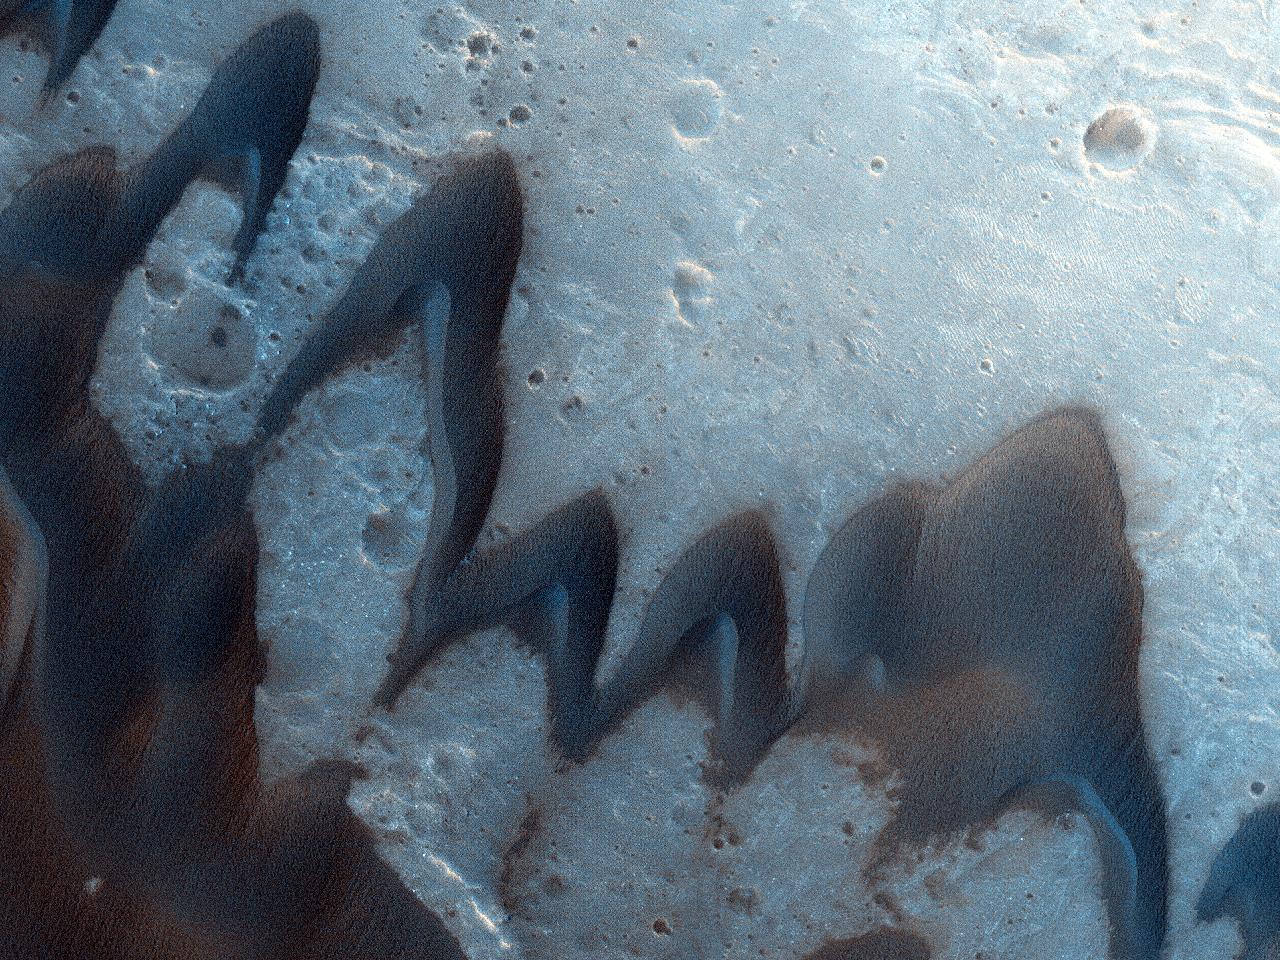 Martian Barchans